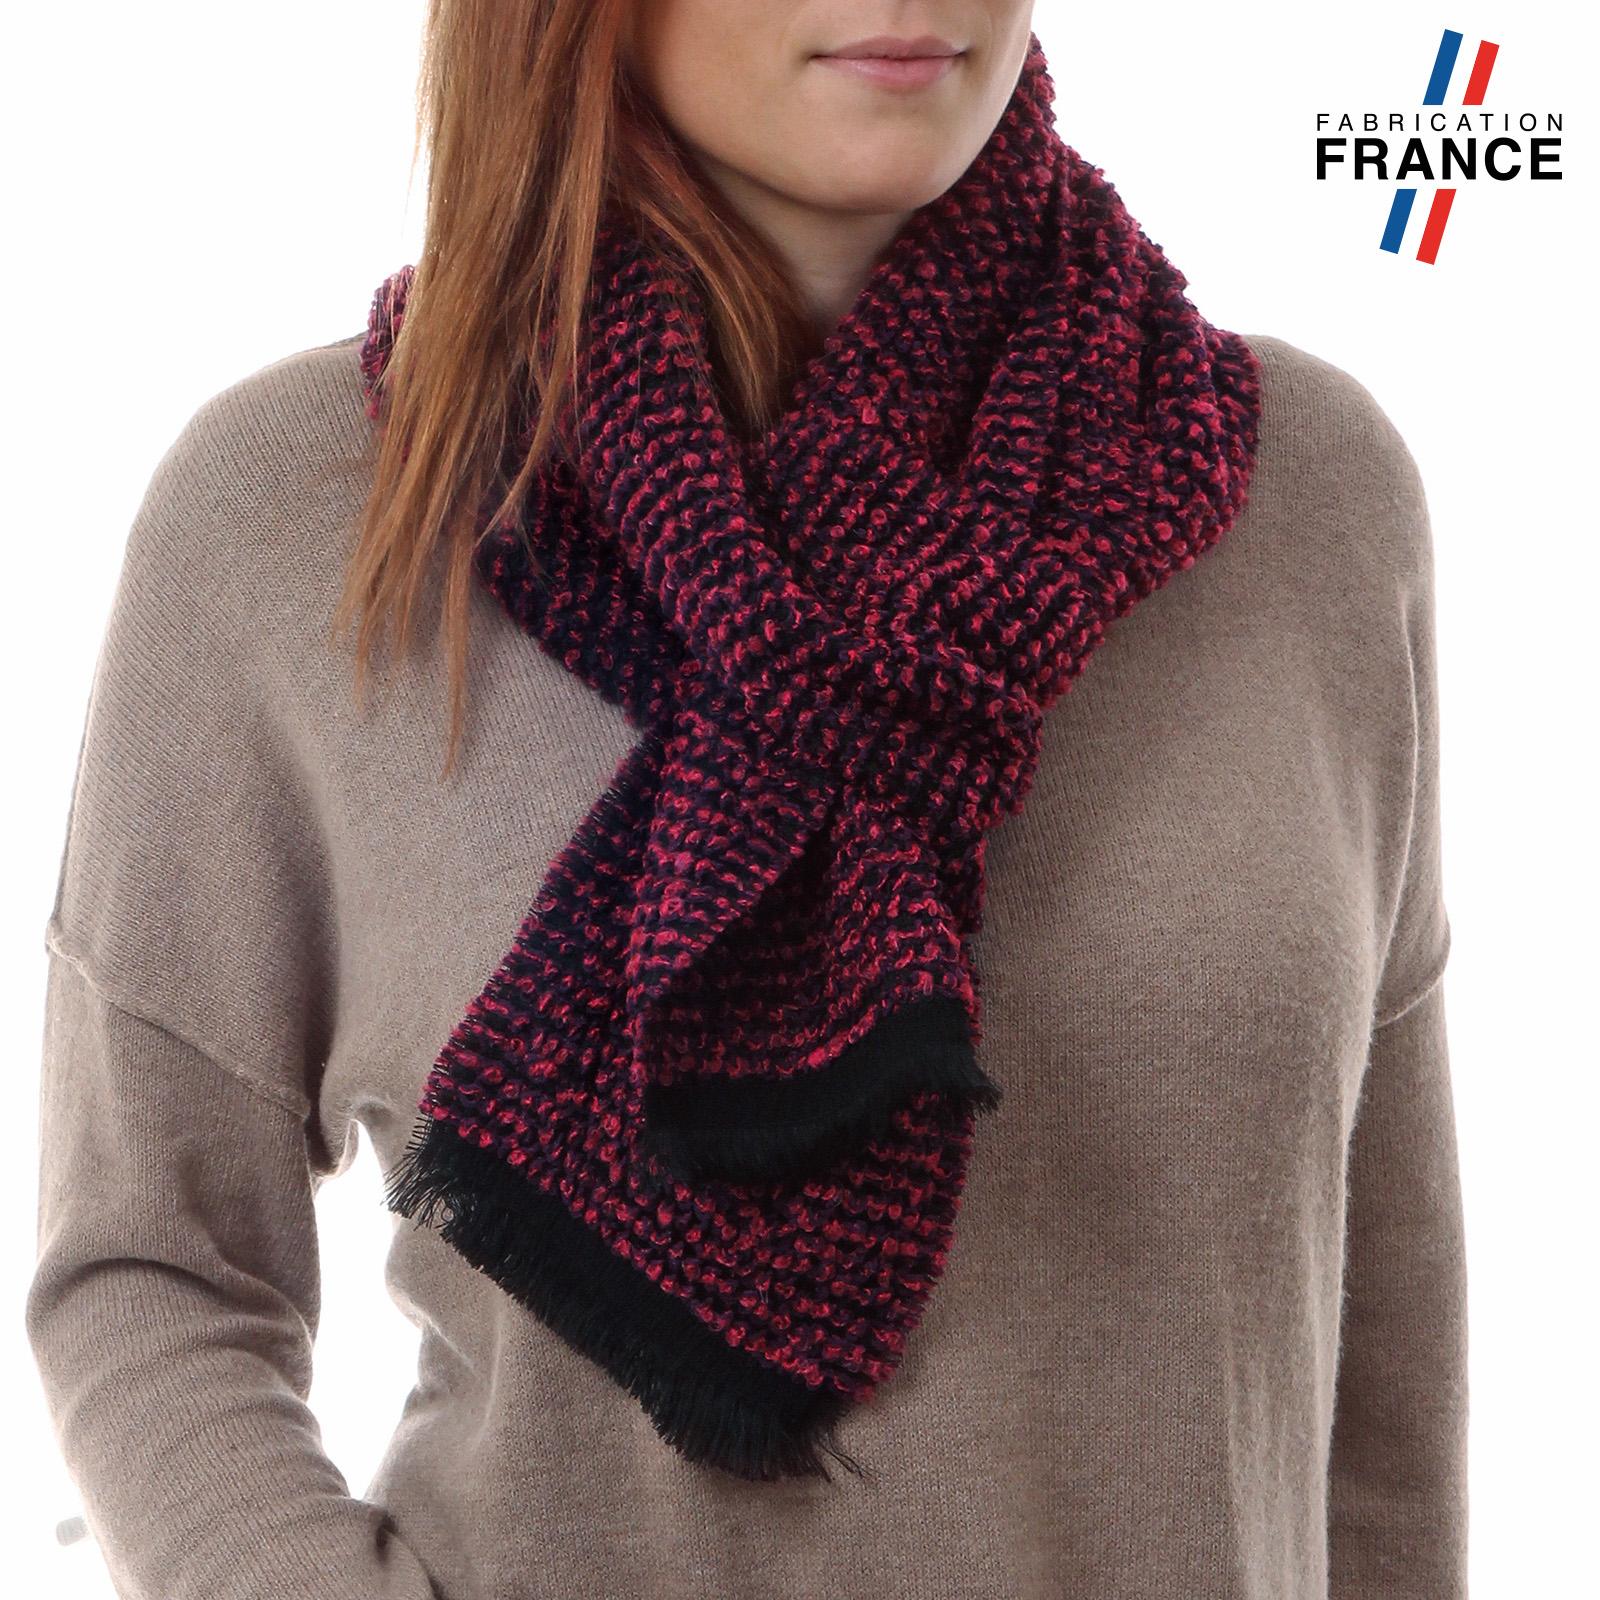 AT-03477-V16-echarpe-femme-fabrication-france-fuchsia